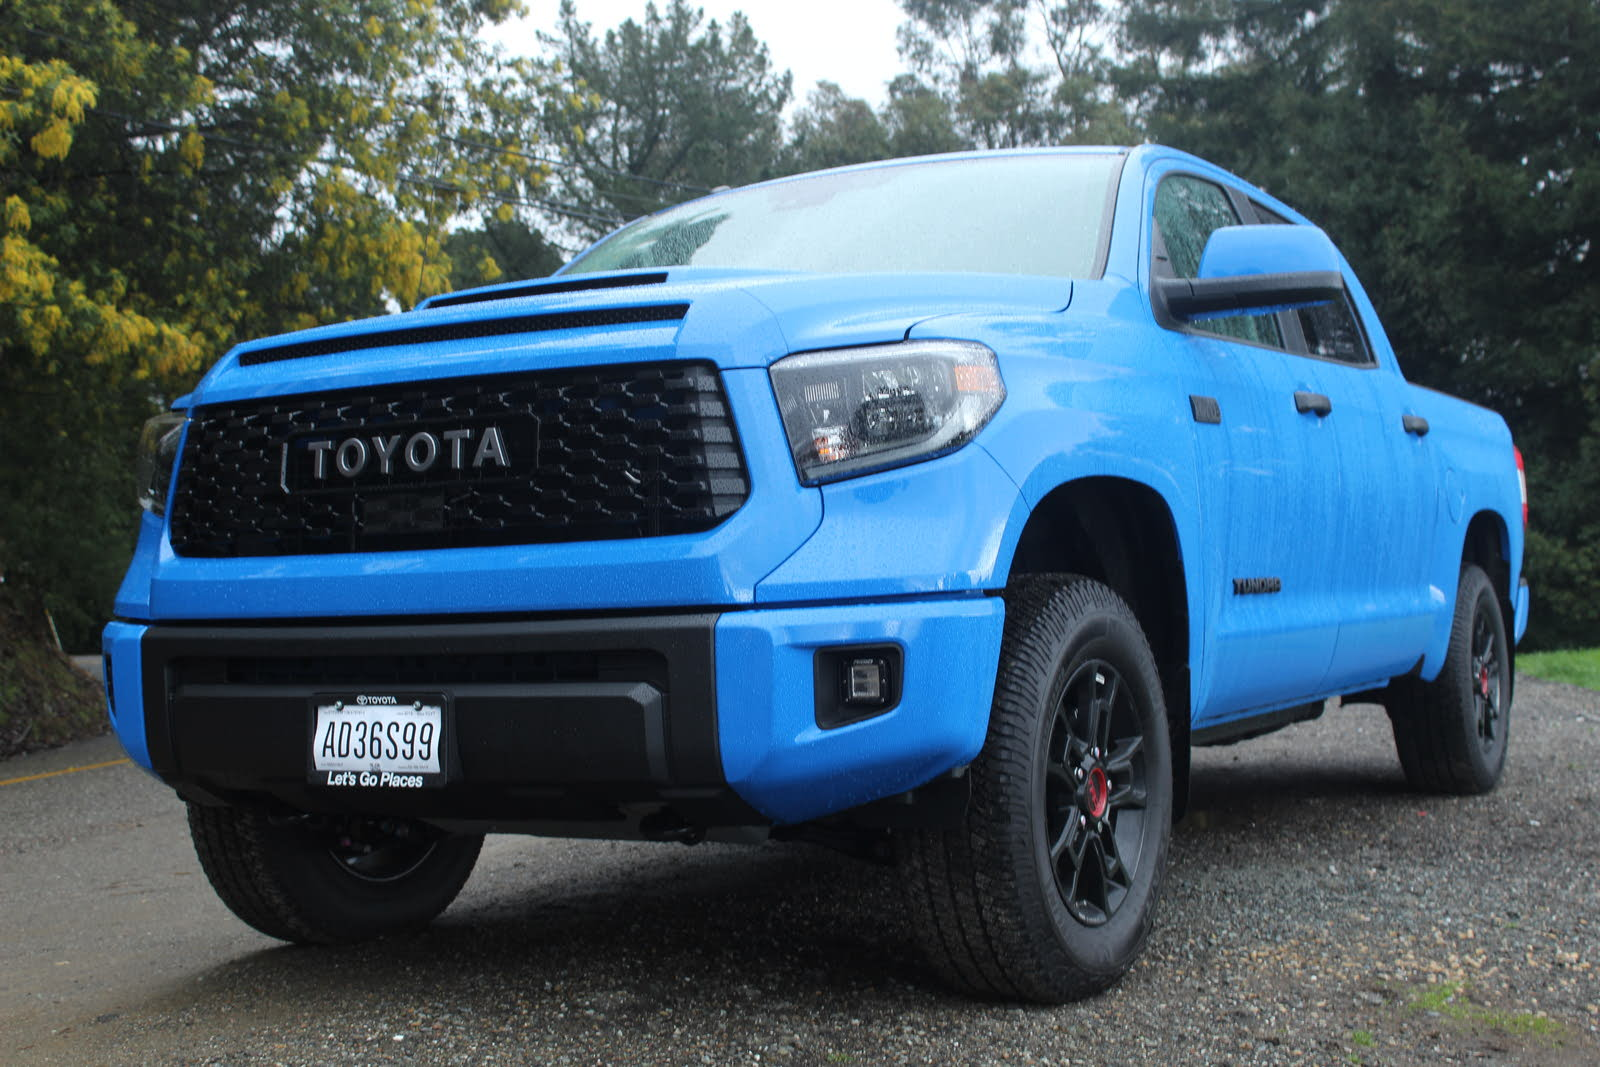 Toyota Tundra Rear Window Replacement >> 2019 Toyota Tundra Overview Cargurus